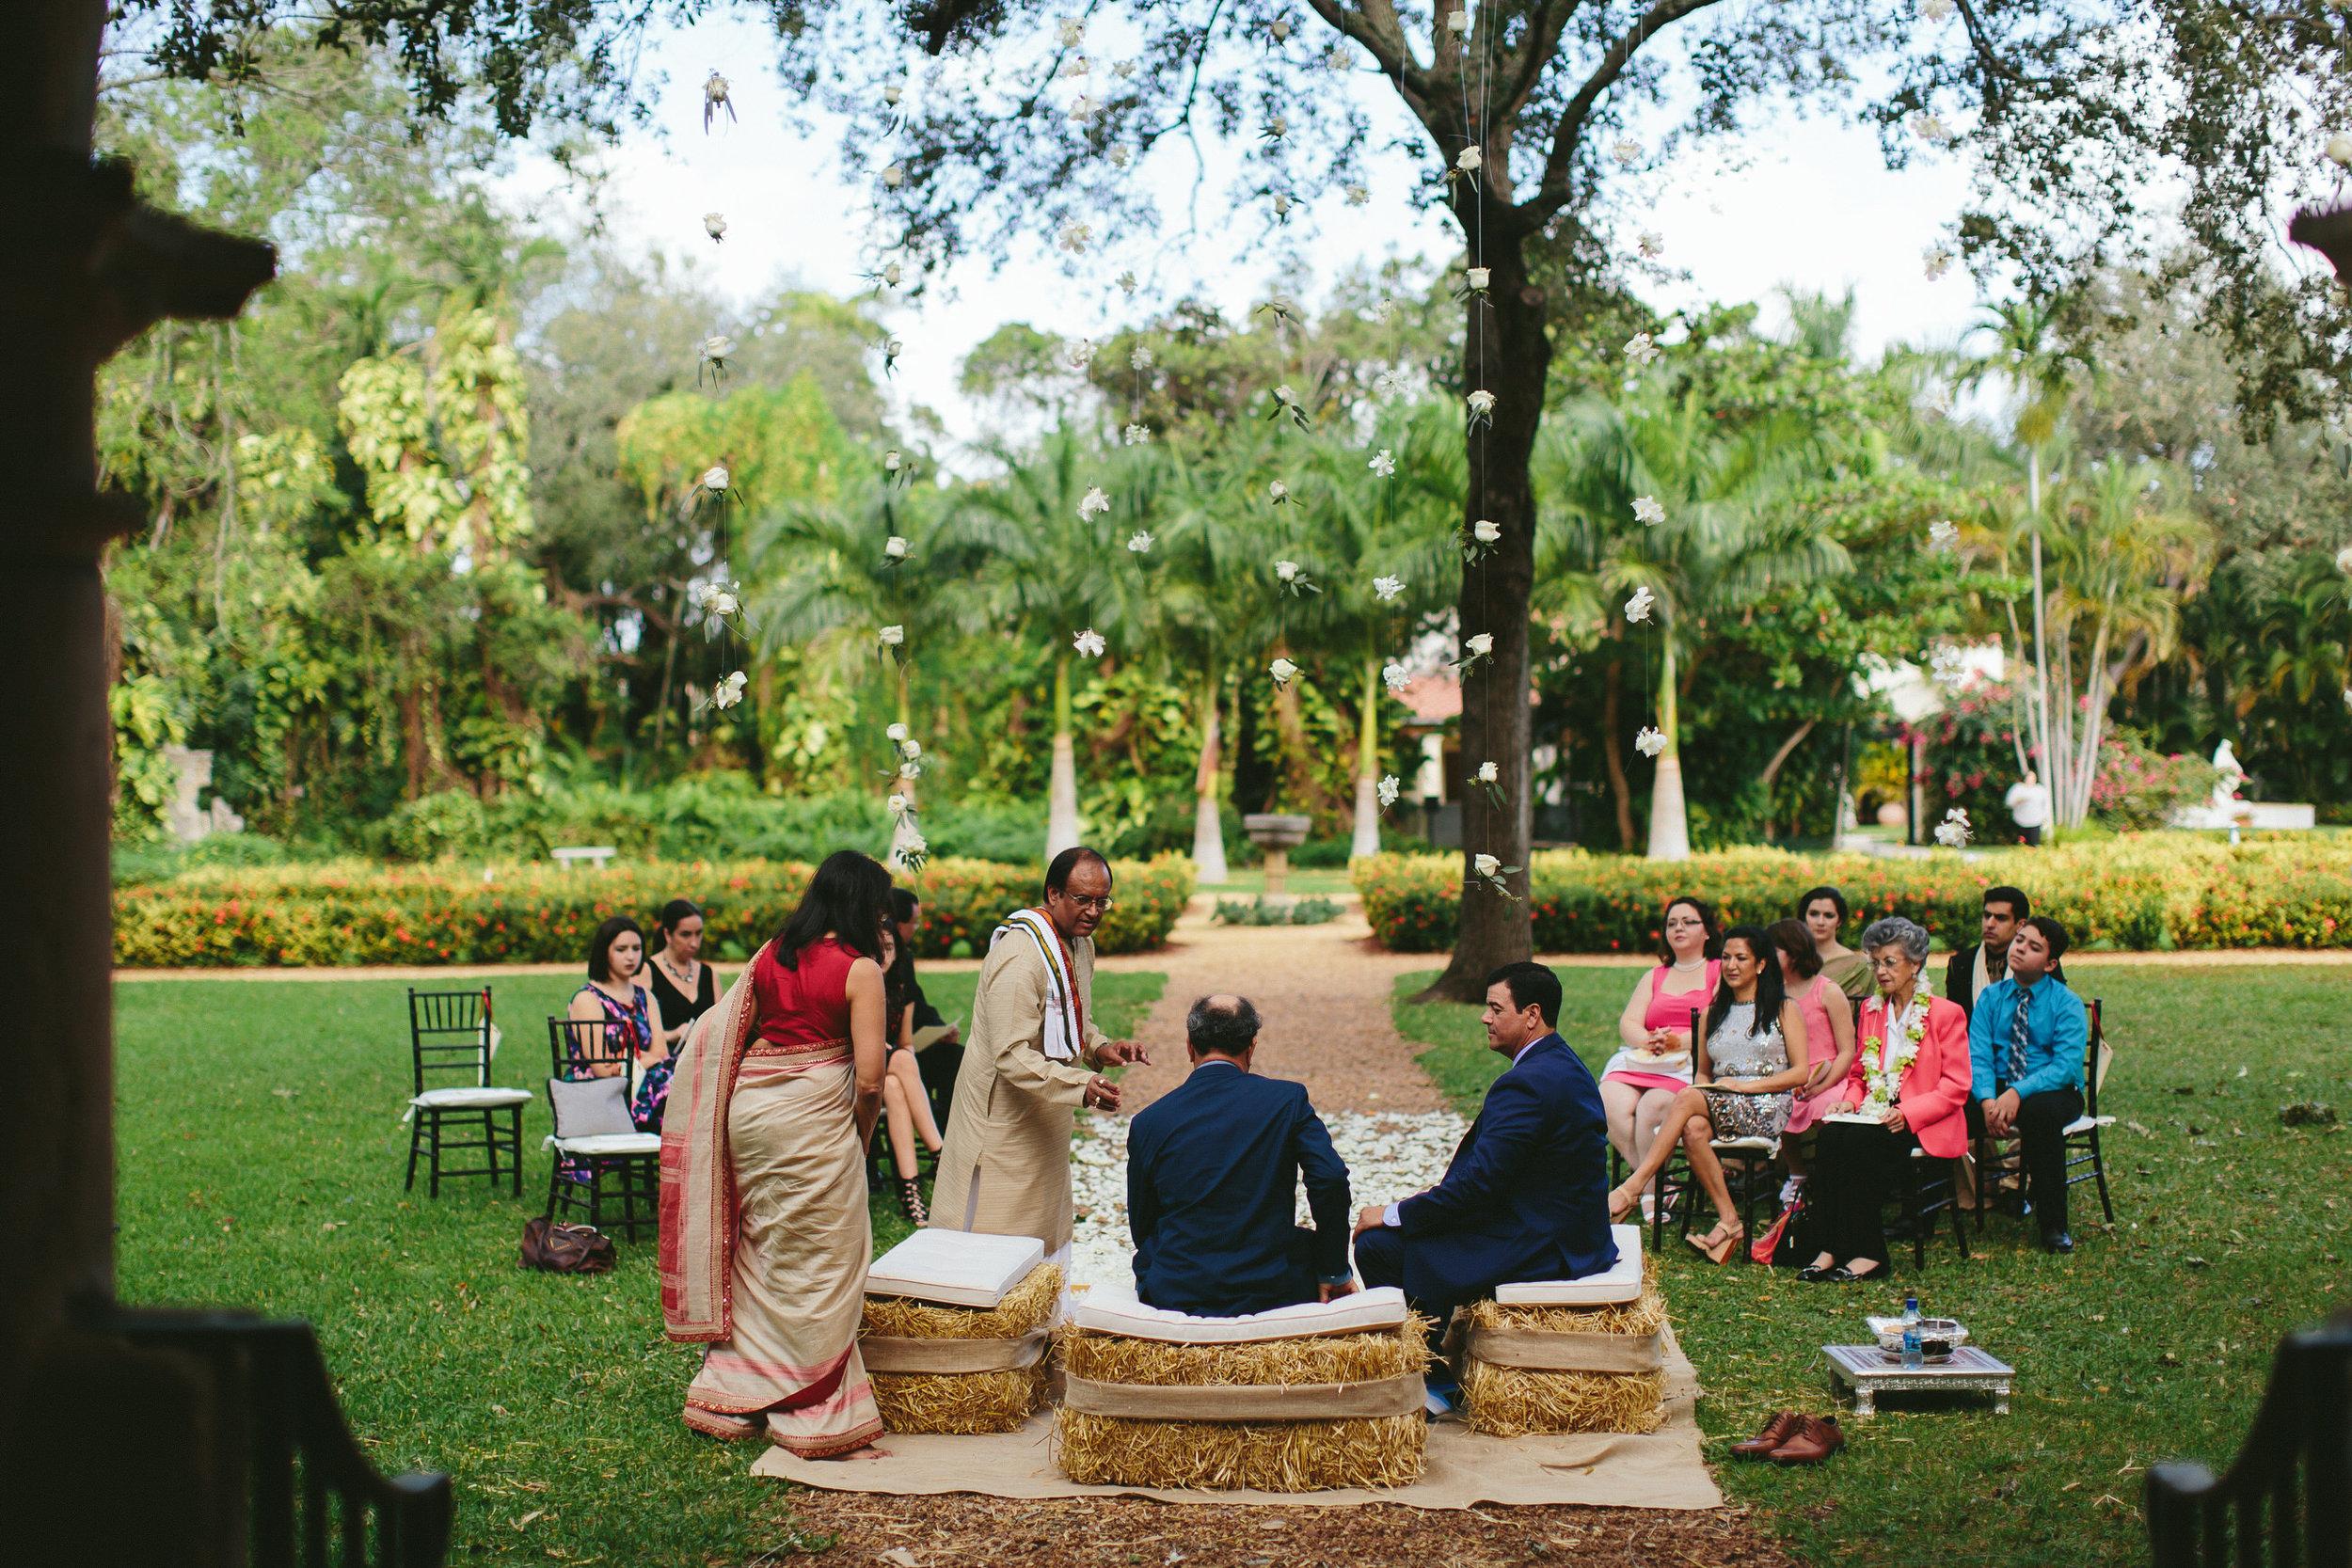 indian-wedding-ceremony-spanish-monestary-tiny-house-photo.jpg